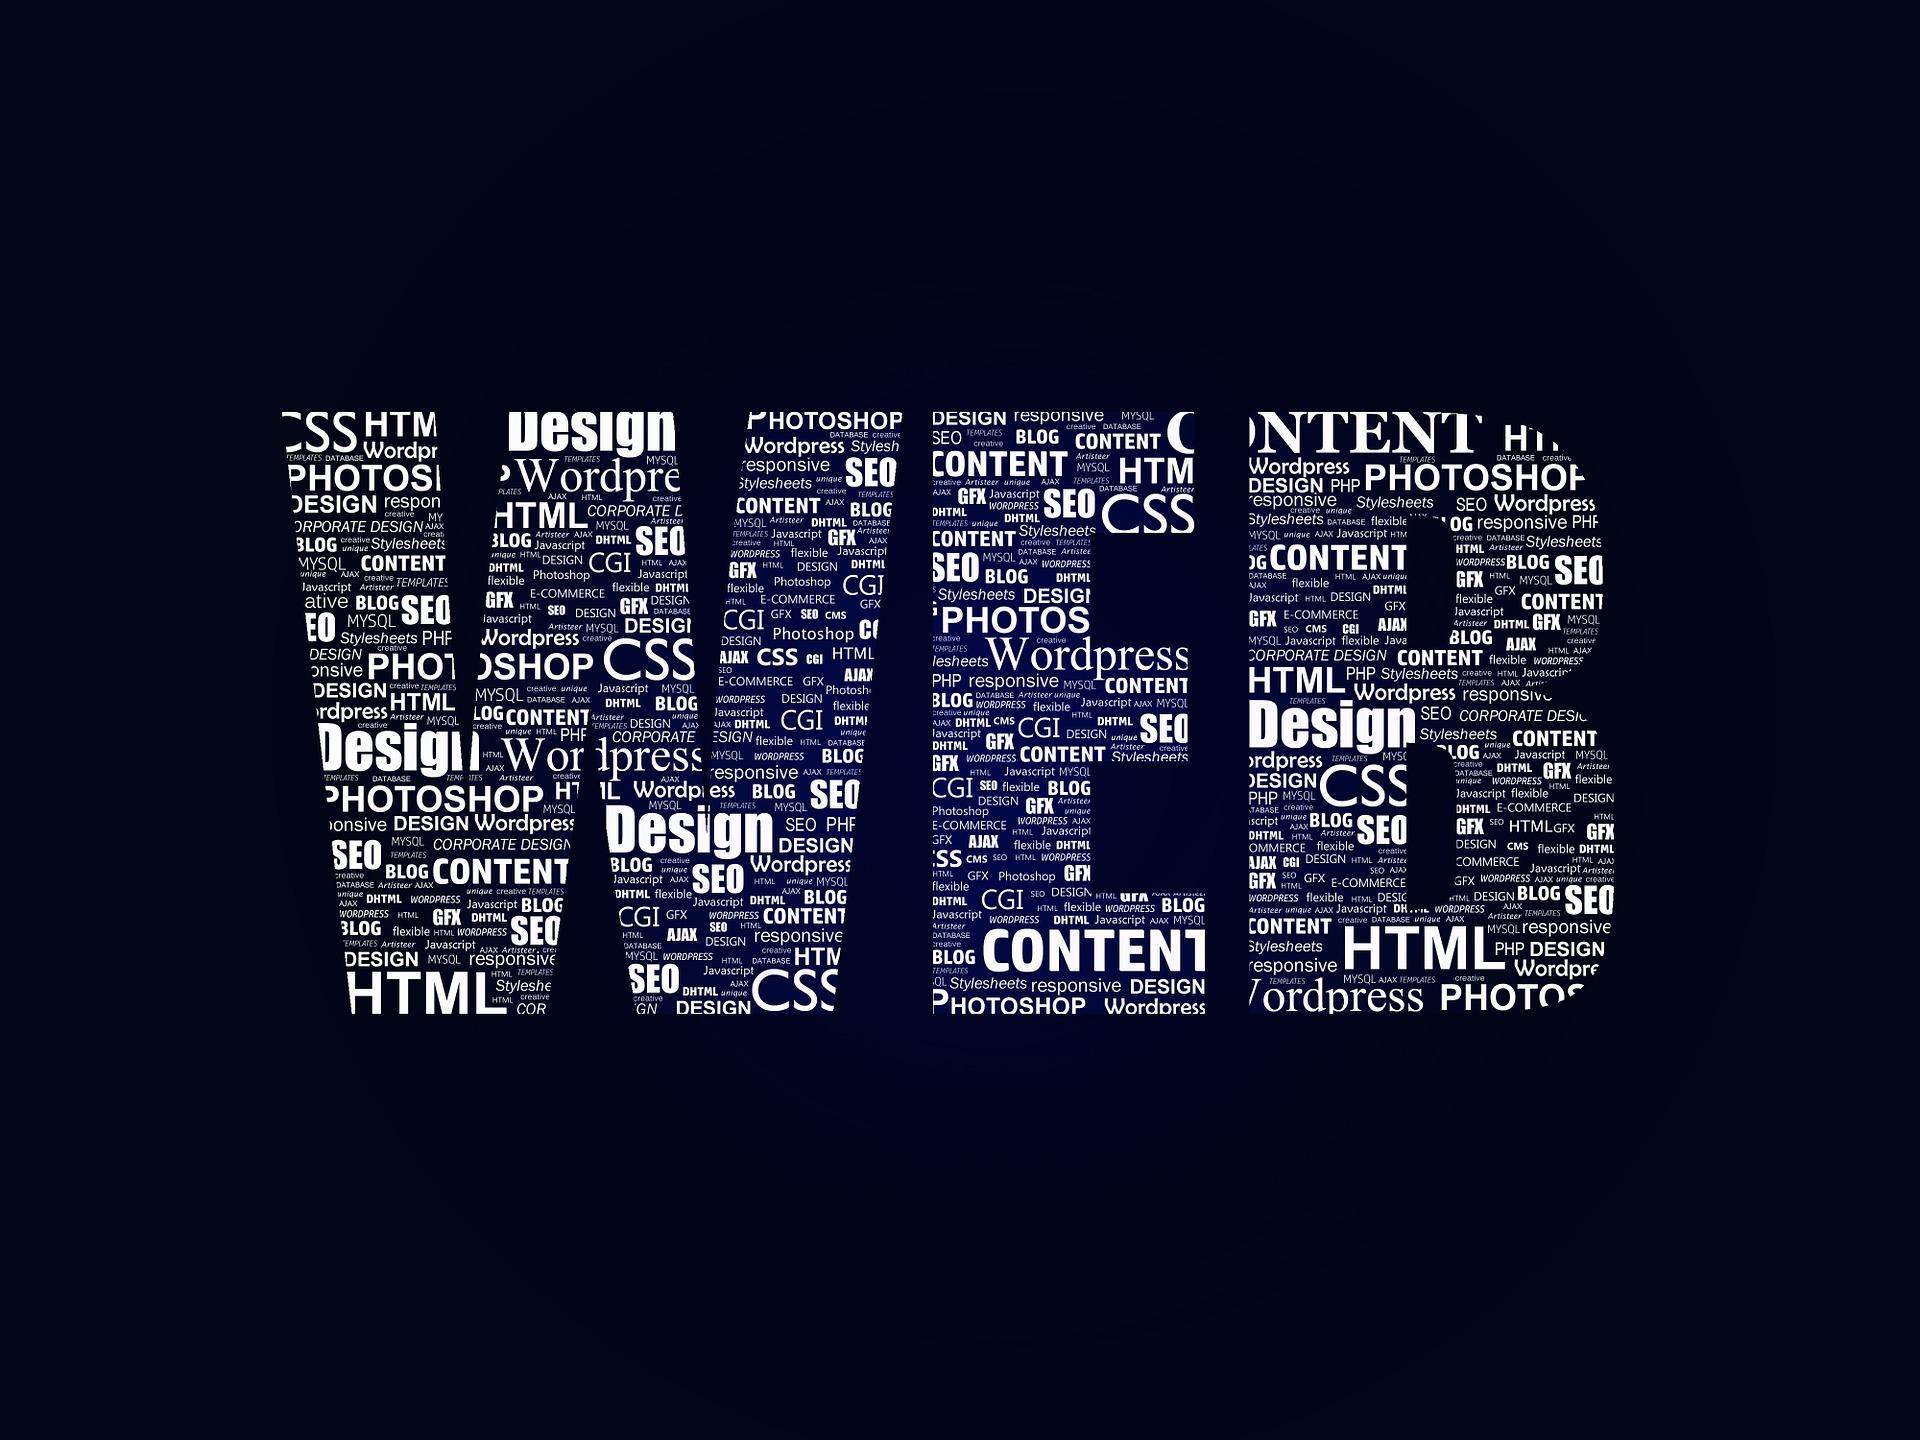 Kako da učinite svoj web brend uspešnim?